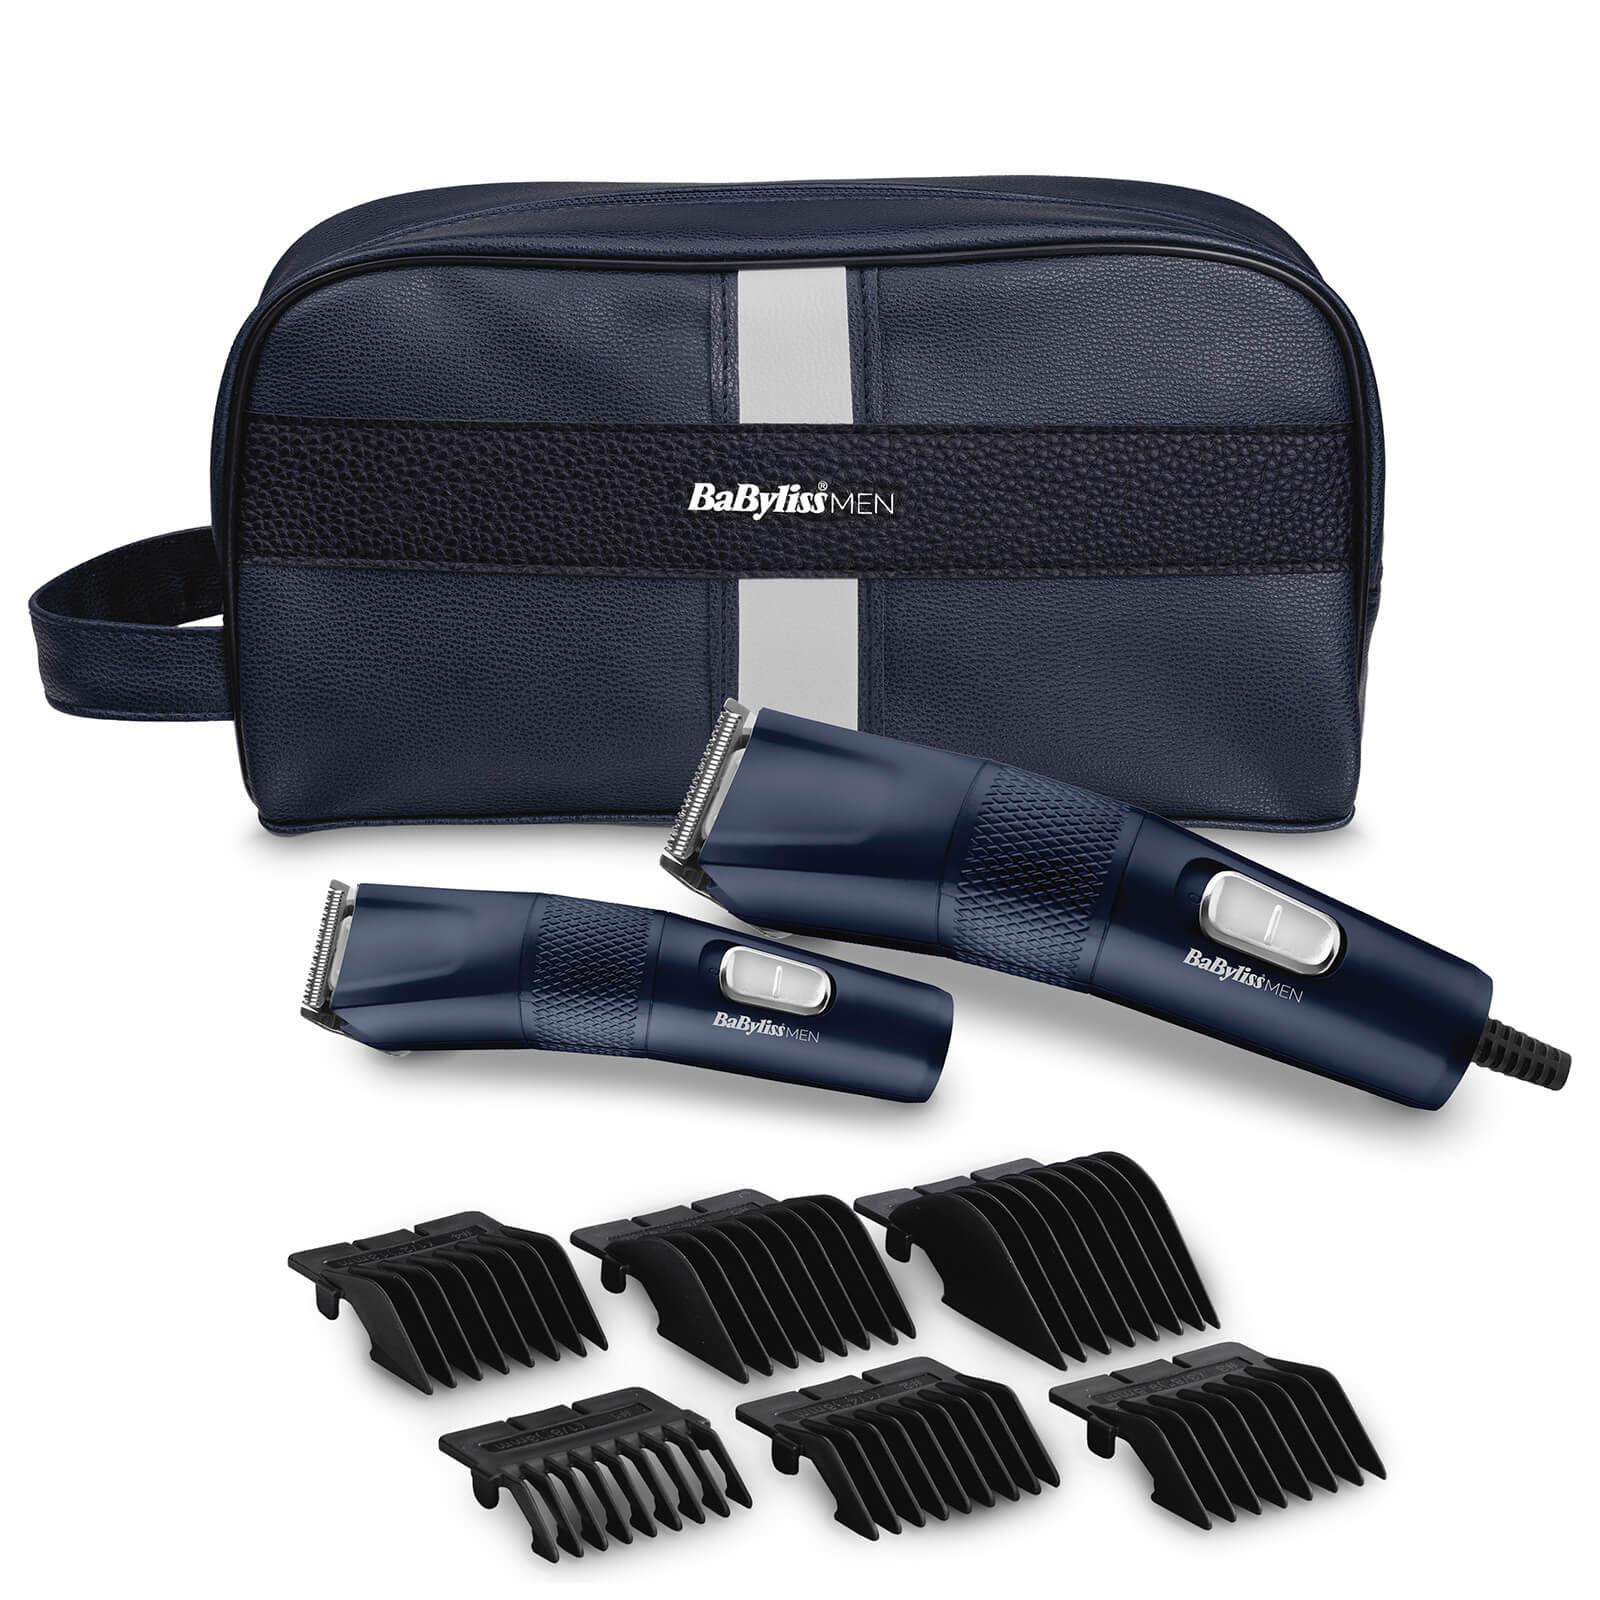 babylissmen the blue edition hair clipper gift set